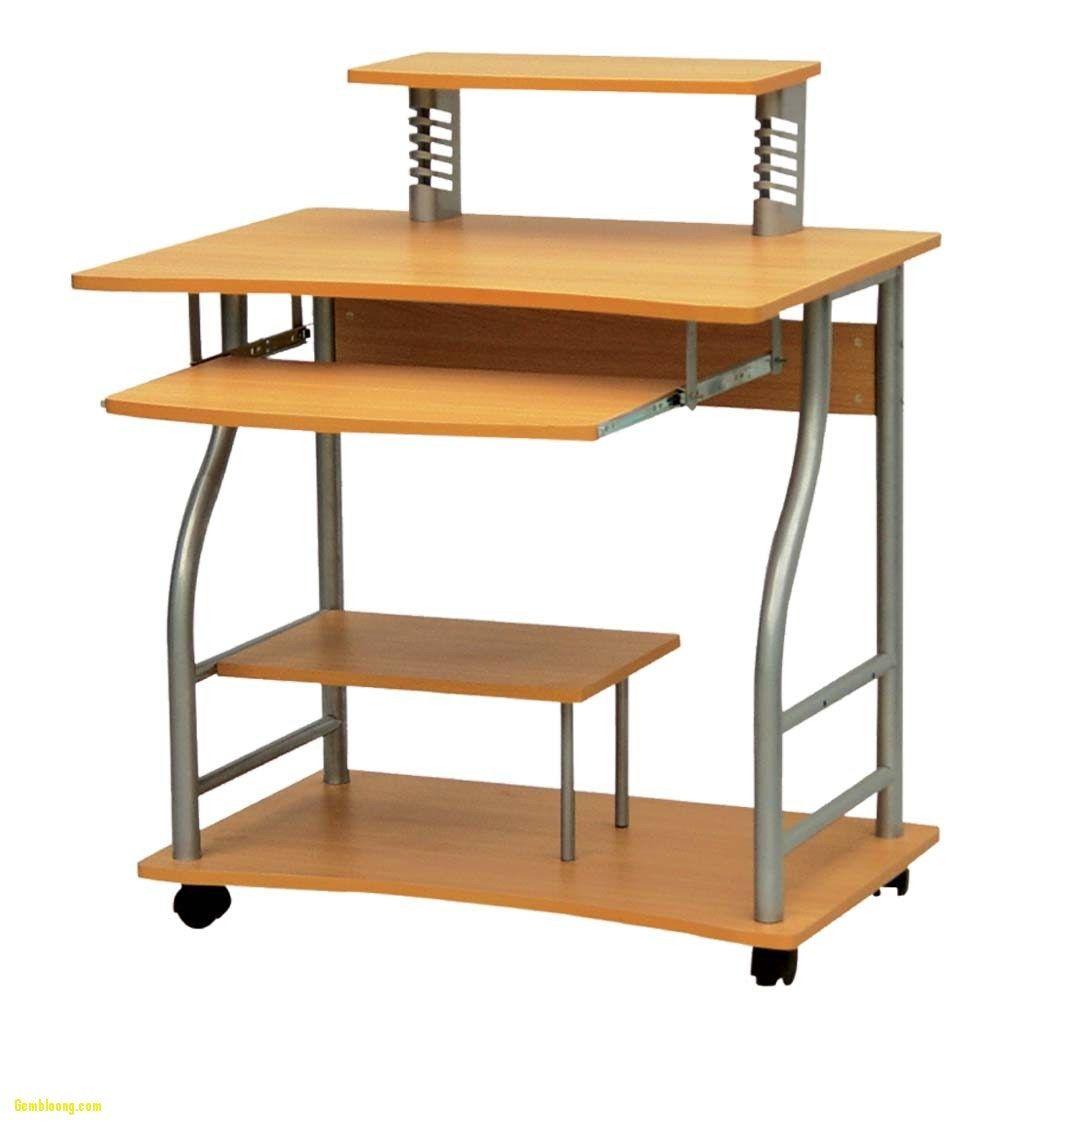 2018 Staples Corner Computer Desk Cool Furniture Ideas Check More At Http Www Shophyperforman Desks For Small Spaces Computer Furniture Small Computer Desk